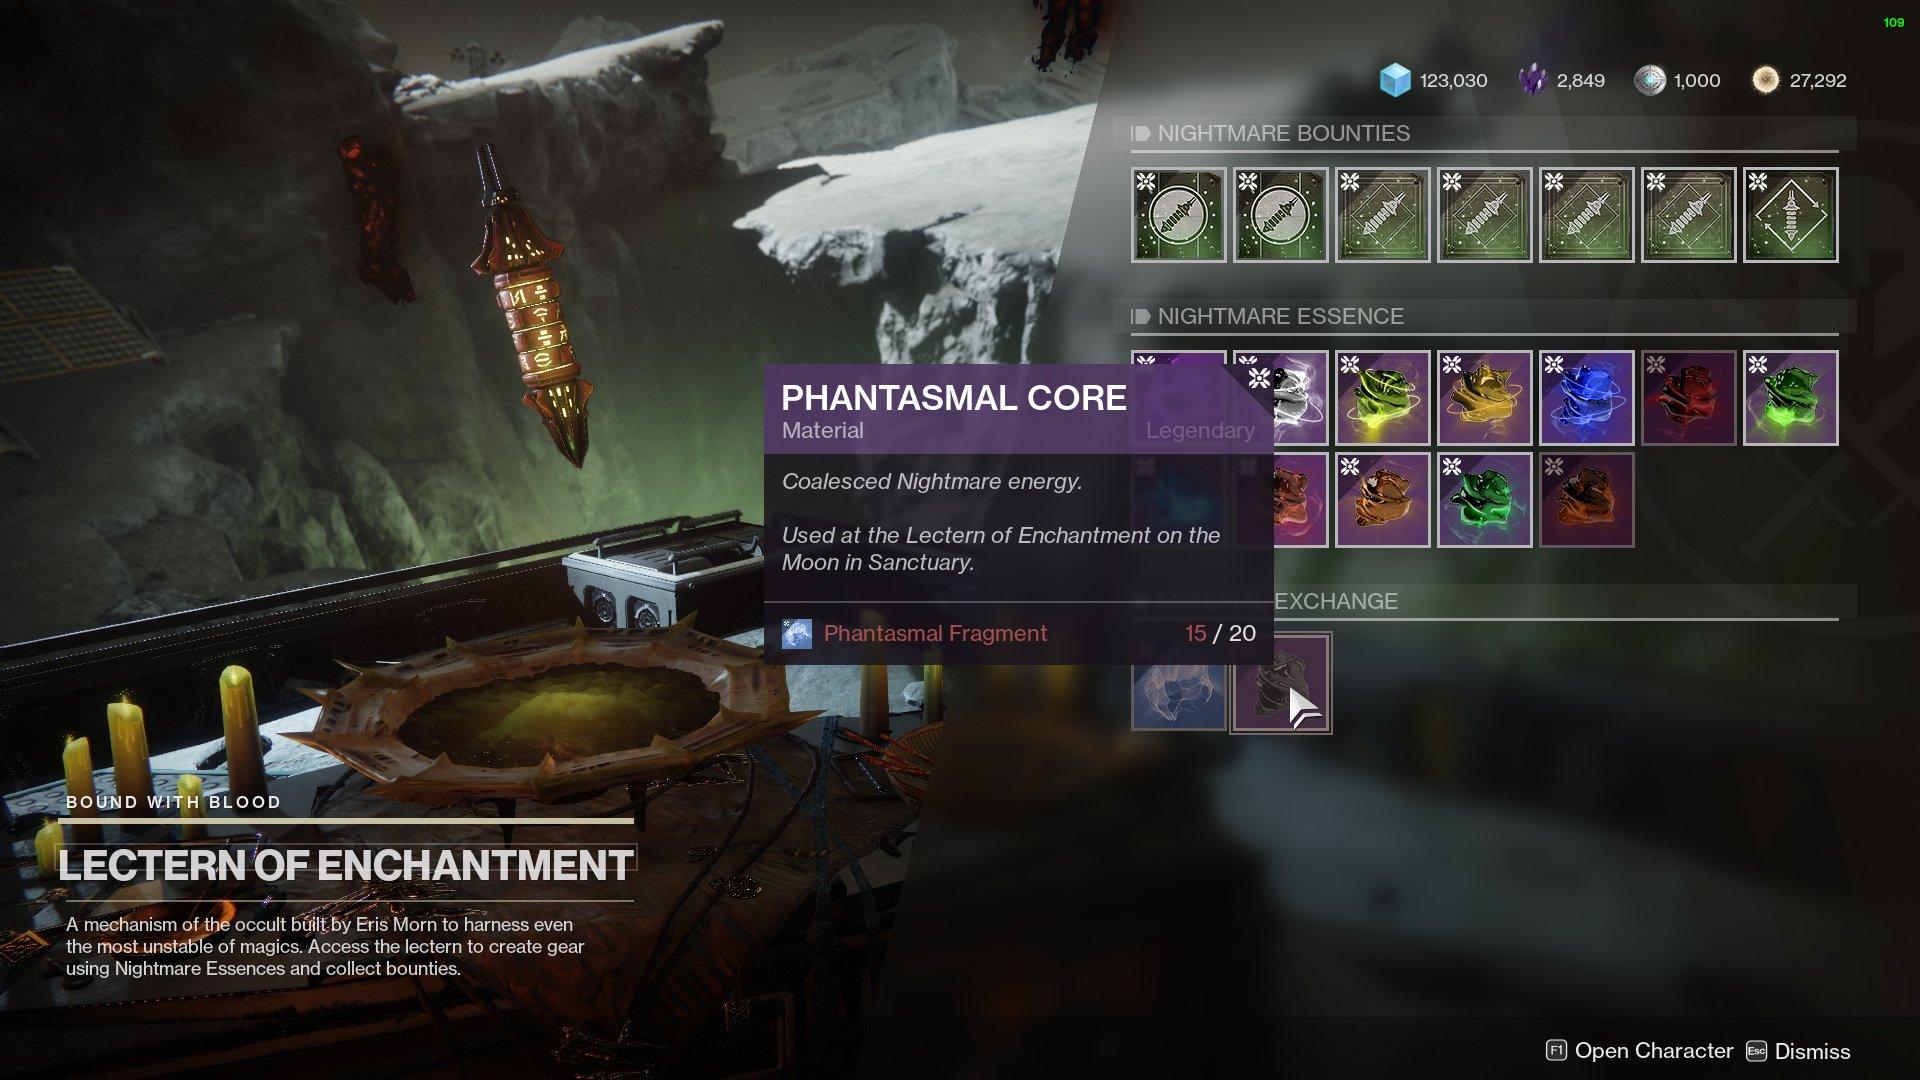 Destiny 2 Phantasmal Core